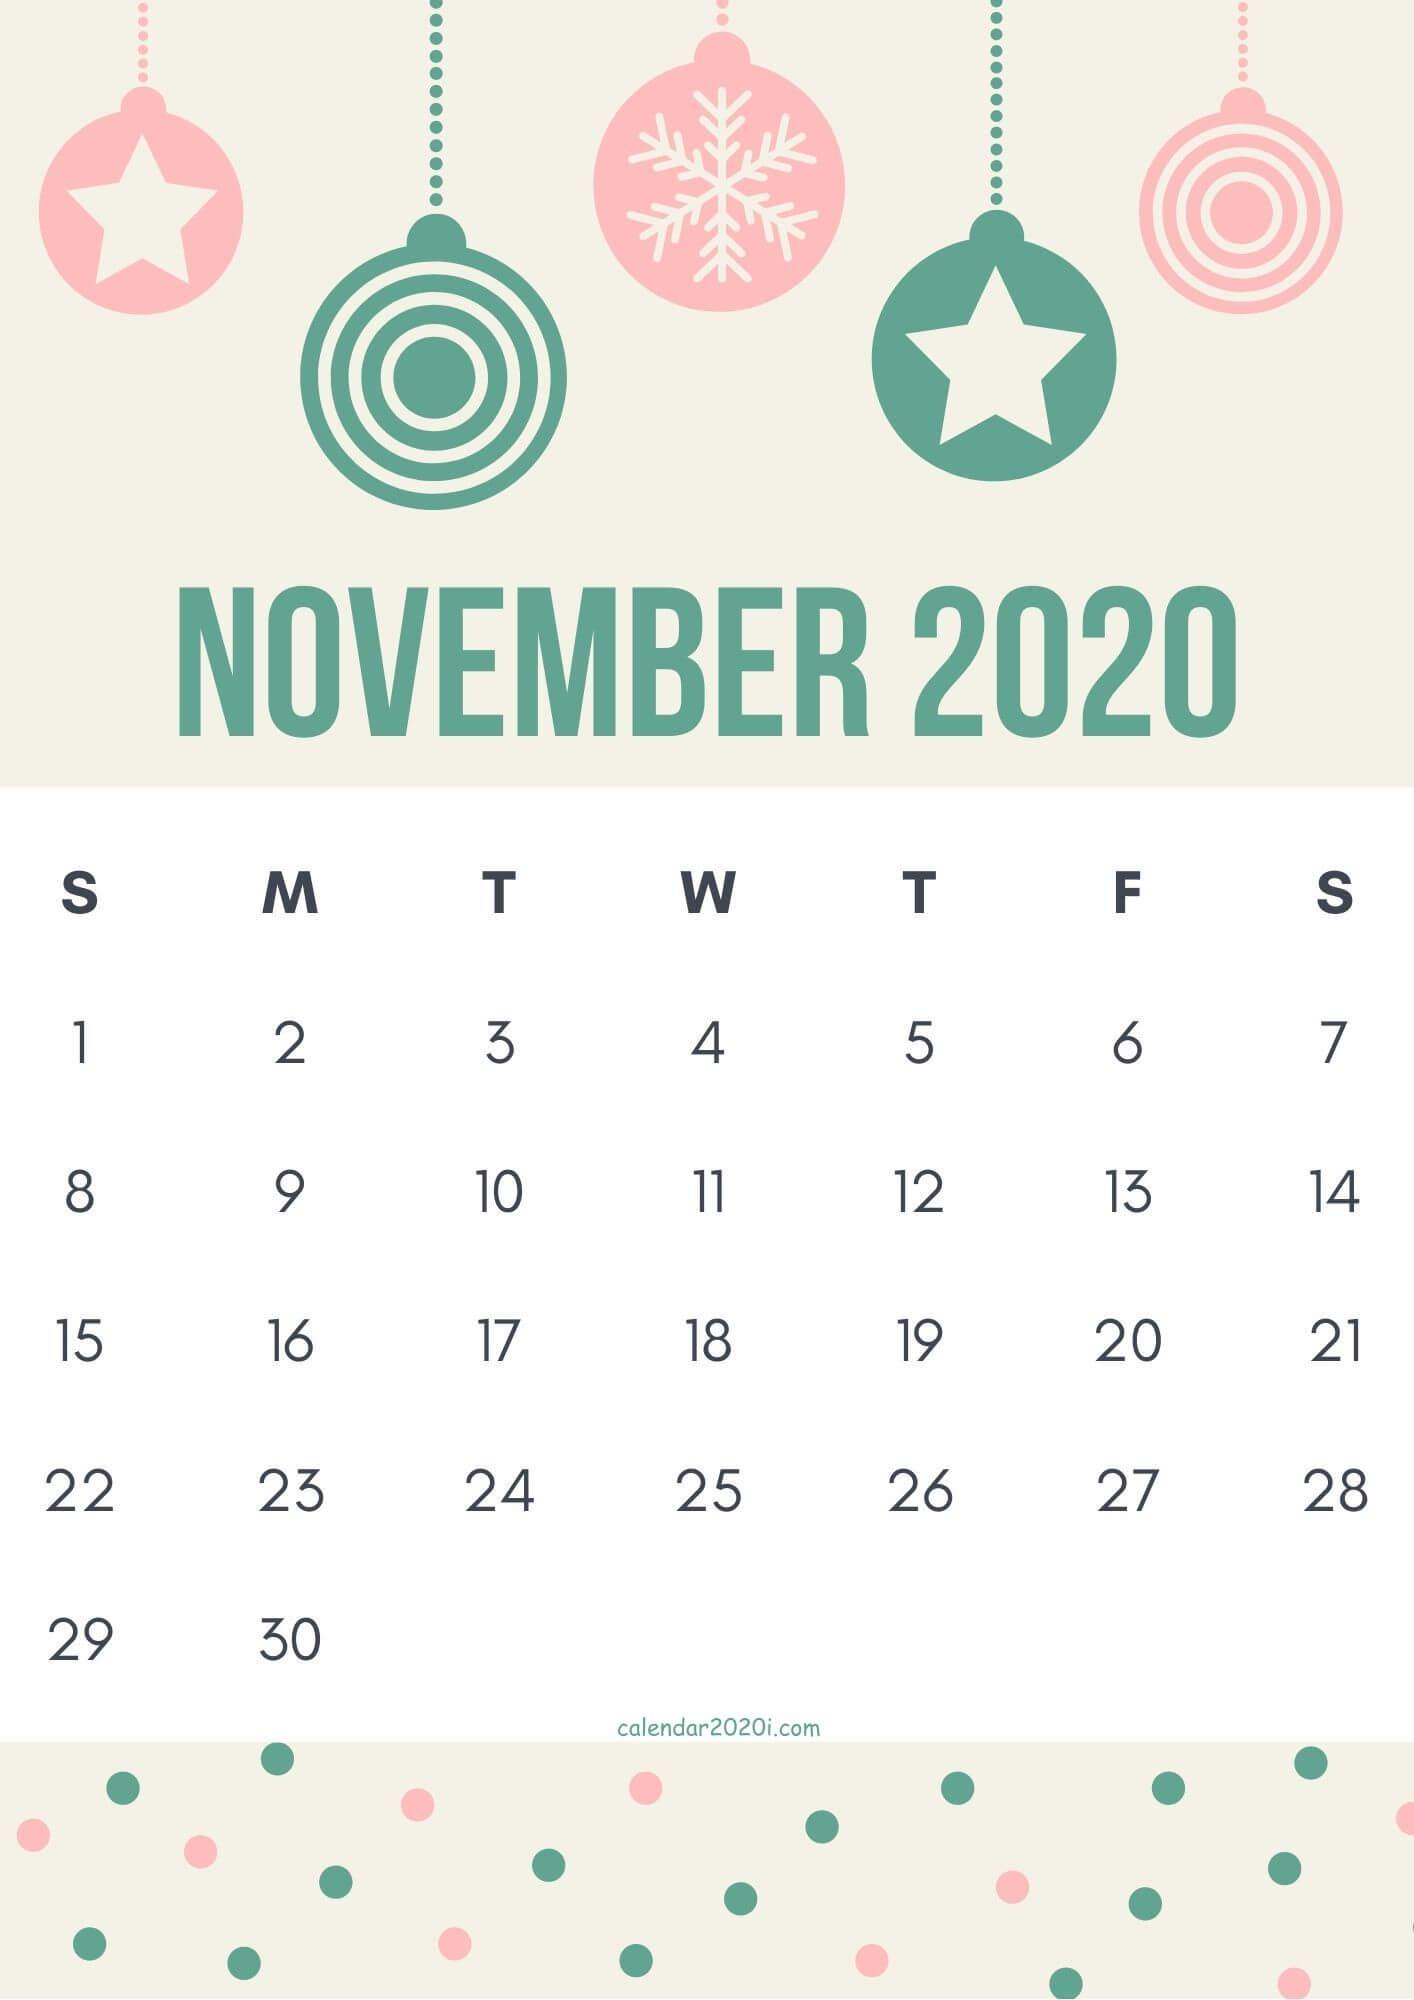 Cute November 2020 Calendar Design